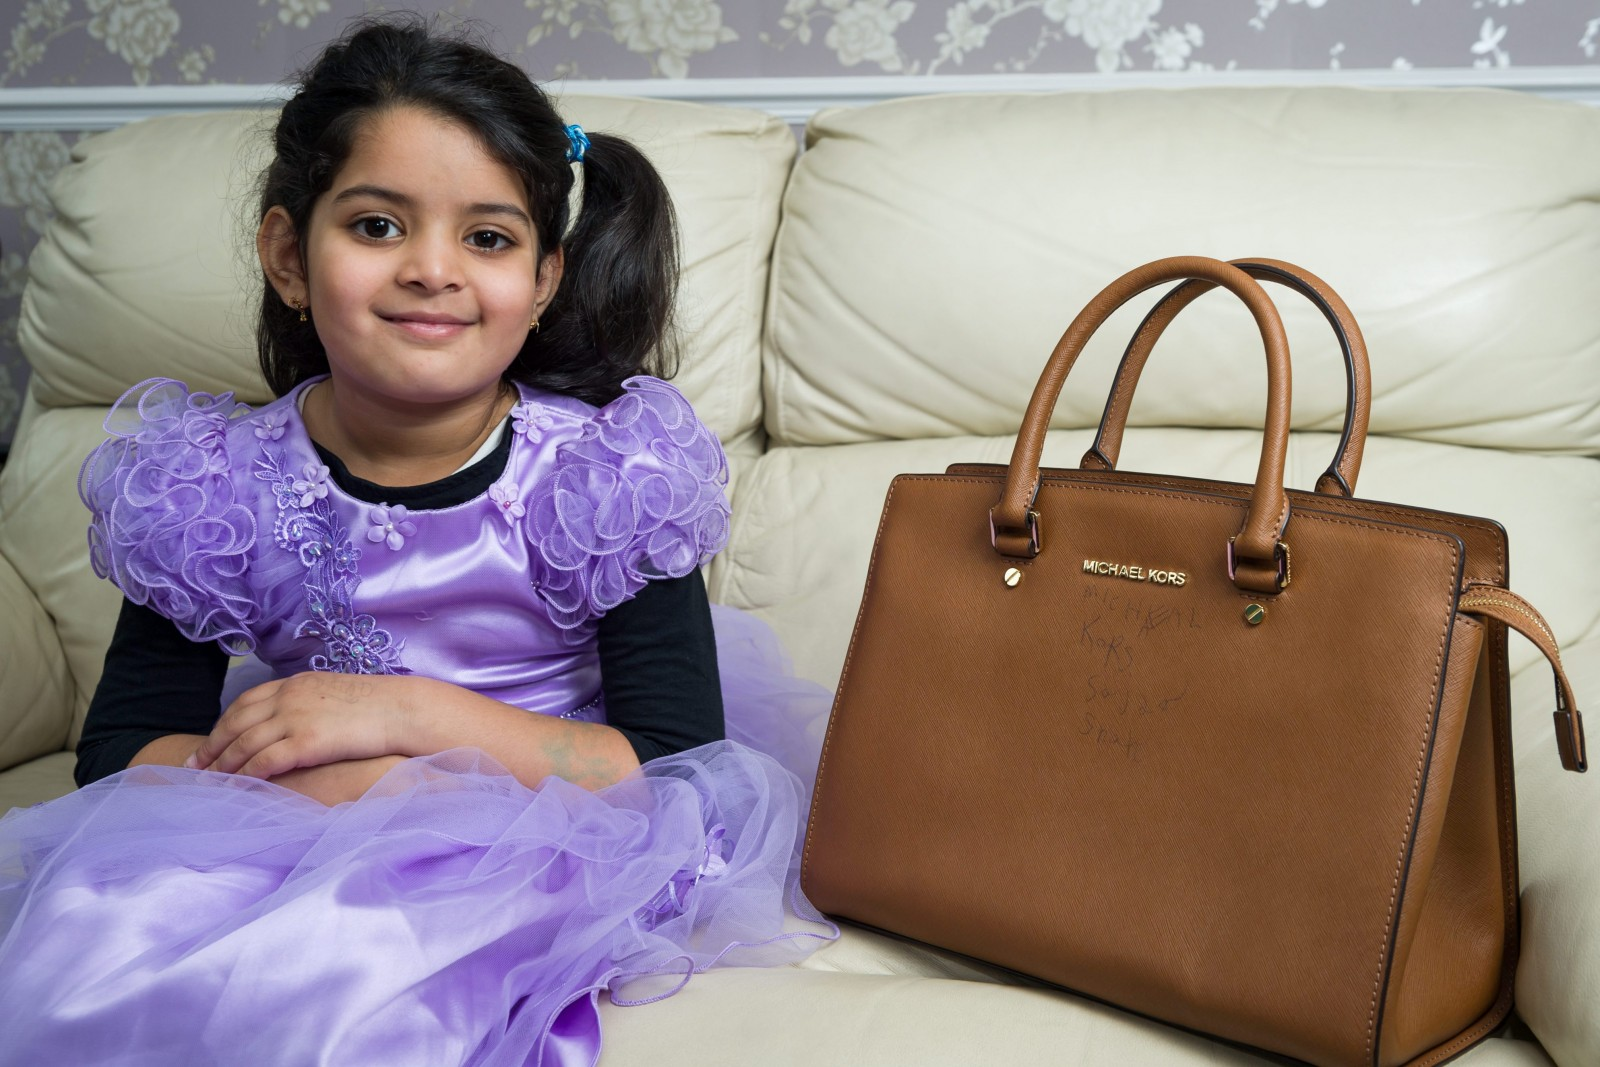 Five-year-old practises her handwriting… on her mum's designer handbag!